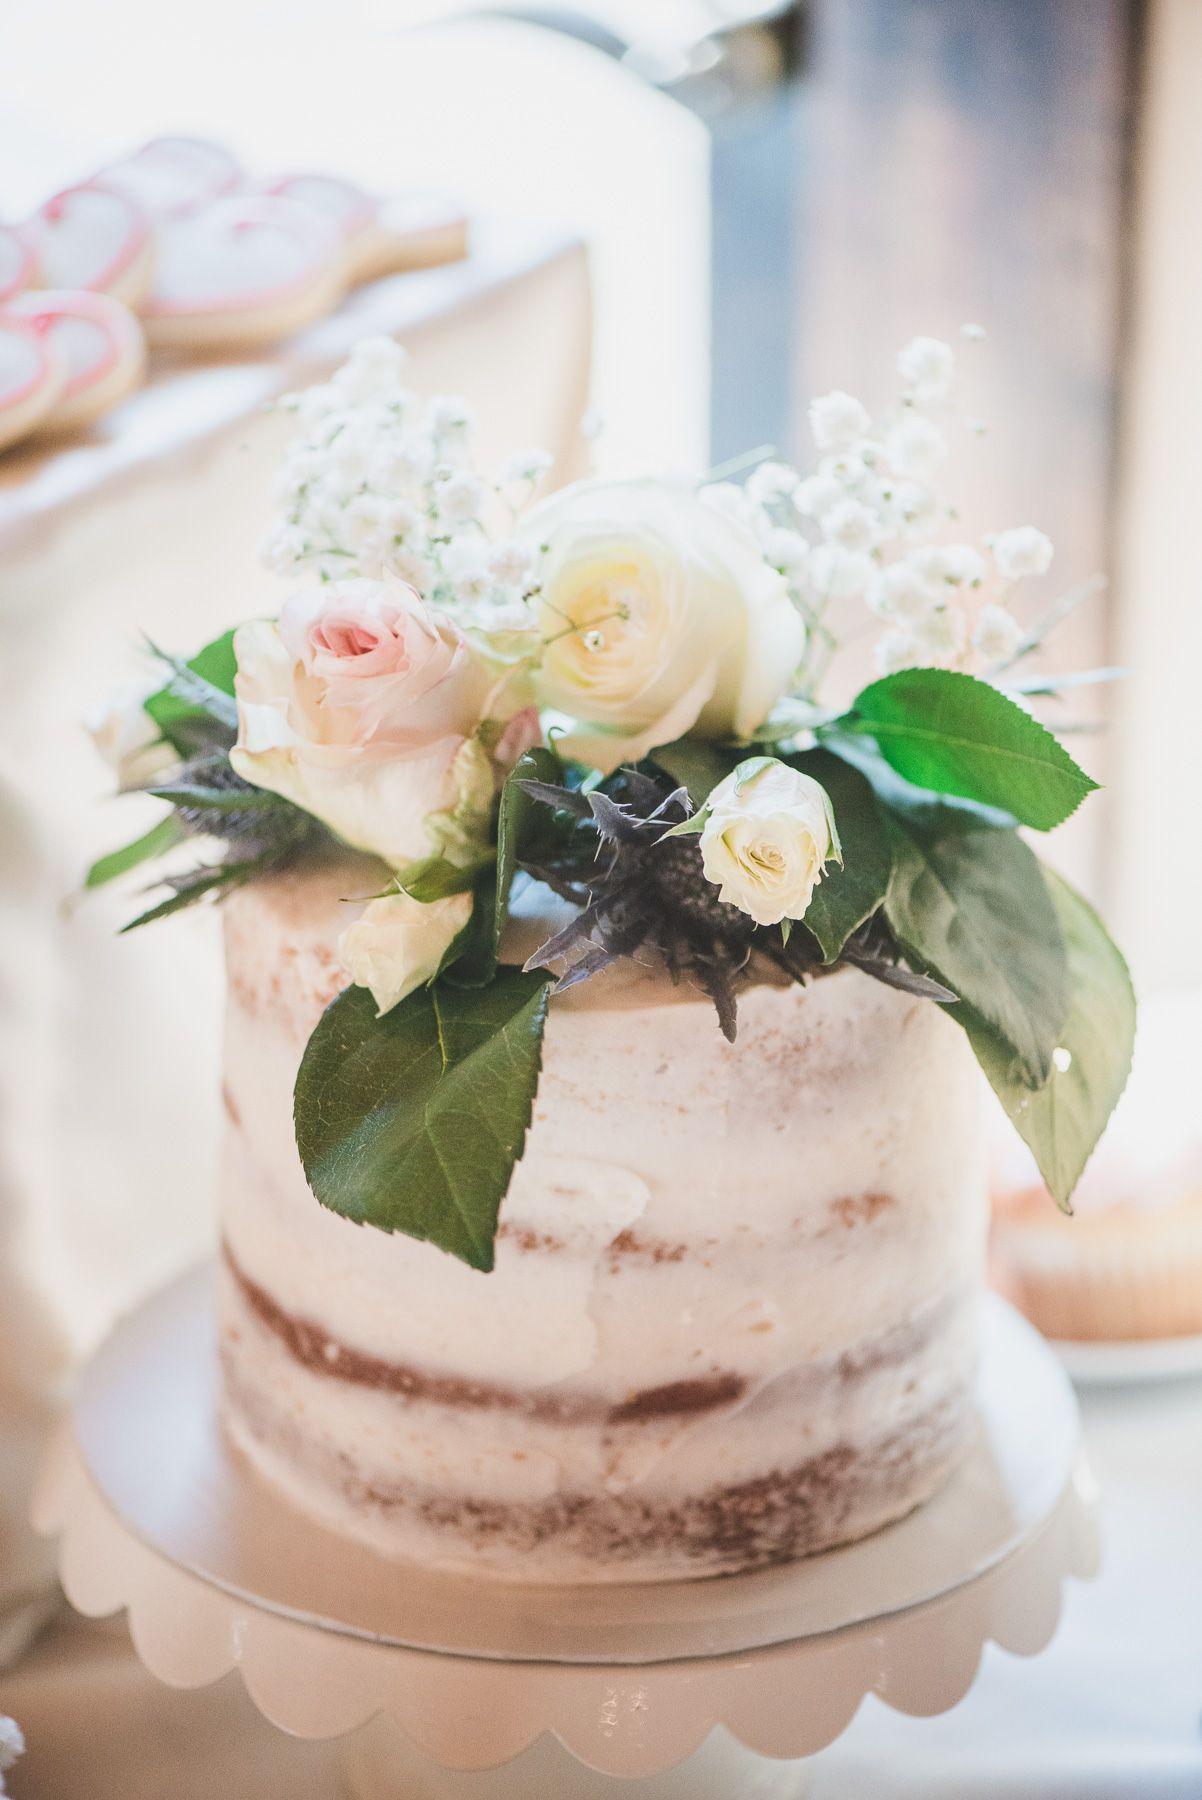 Mini wedding cake with rose topper Magnolia Plantation